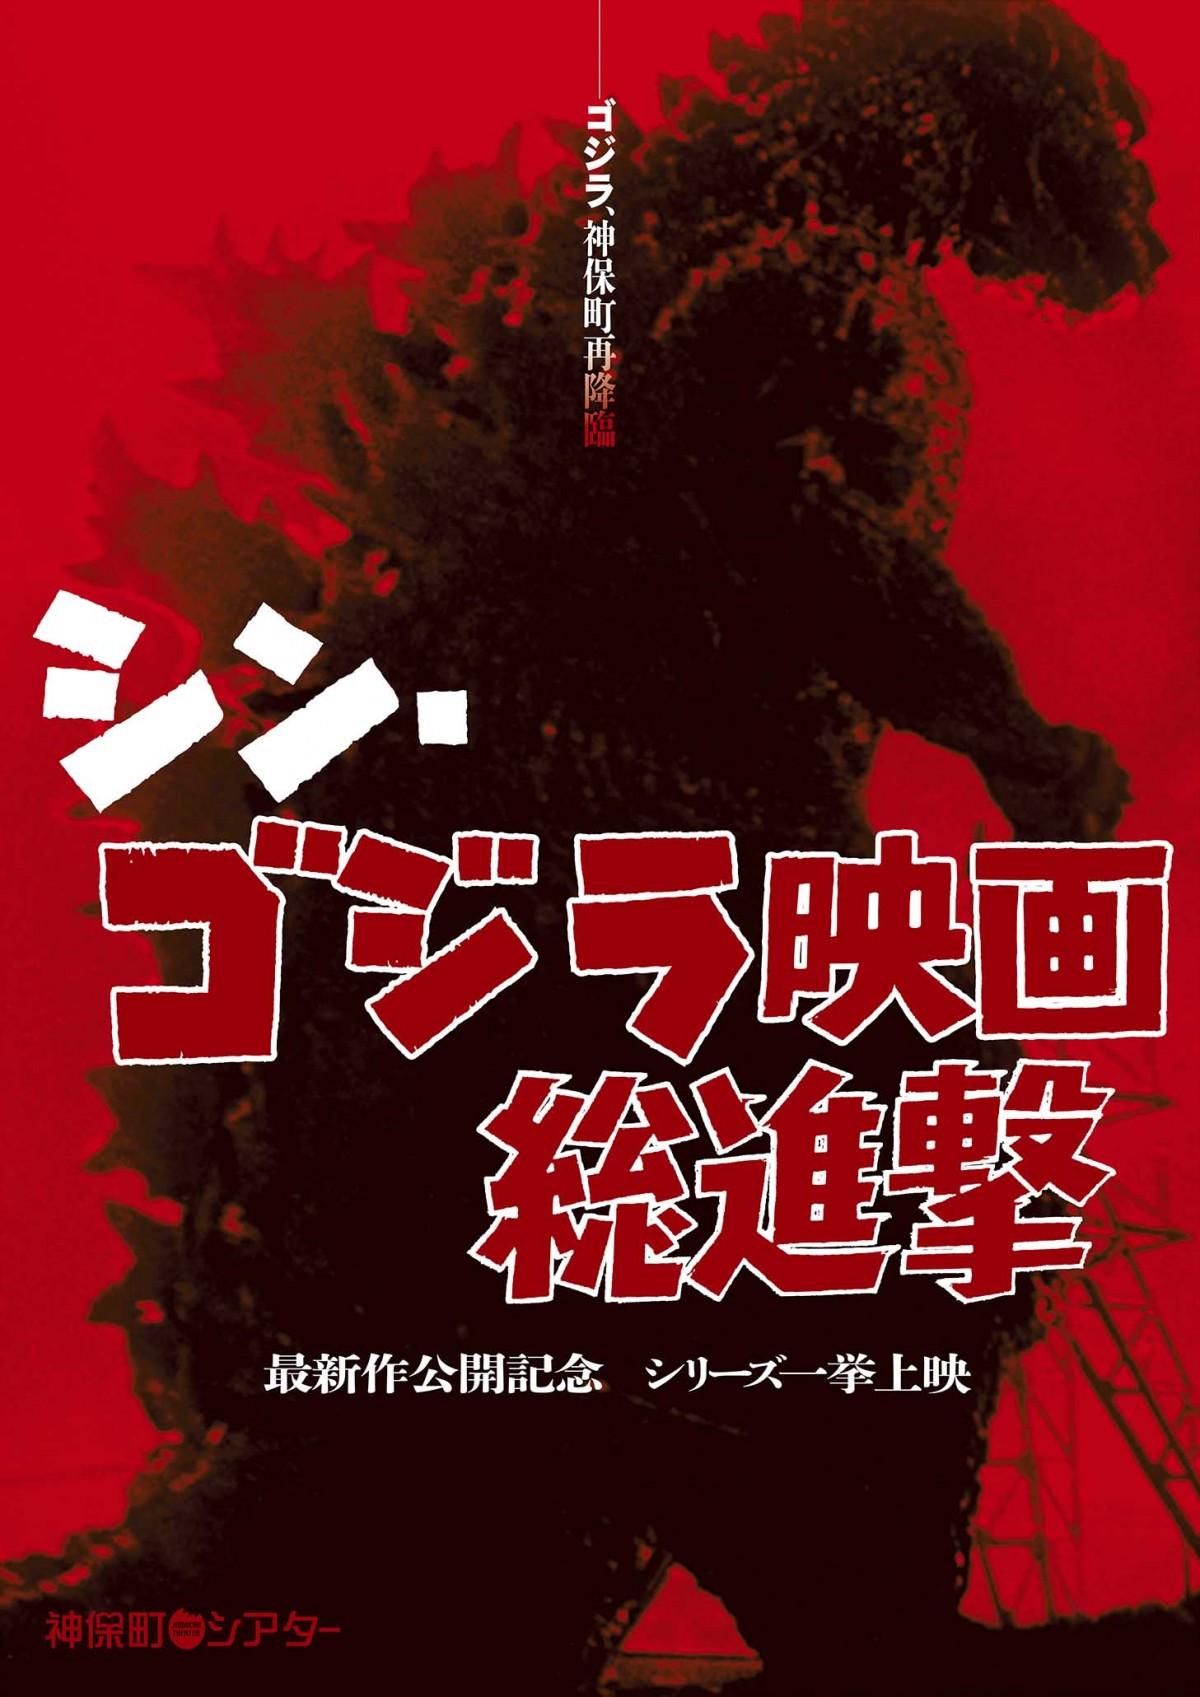 File:Shin Godzilla Movie Marathon.jpg